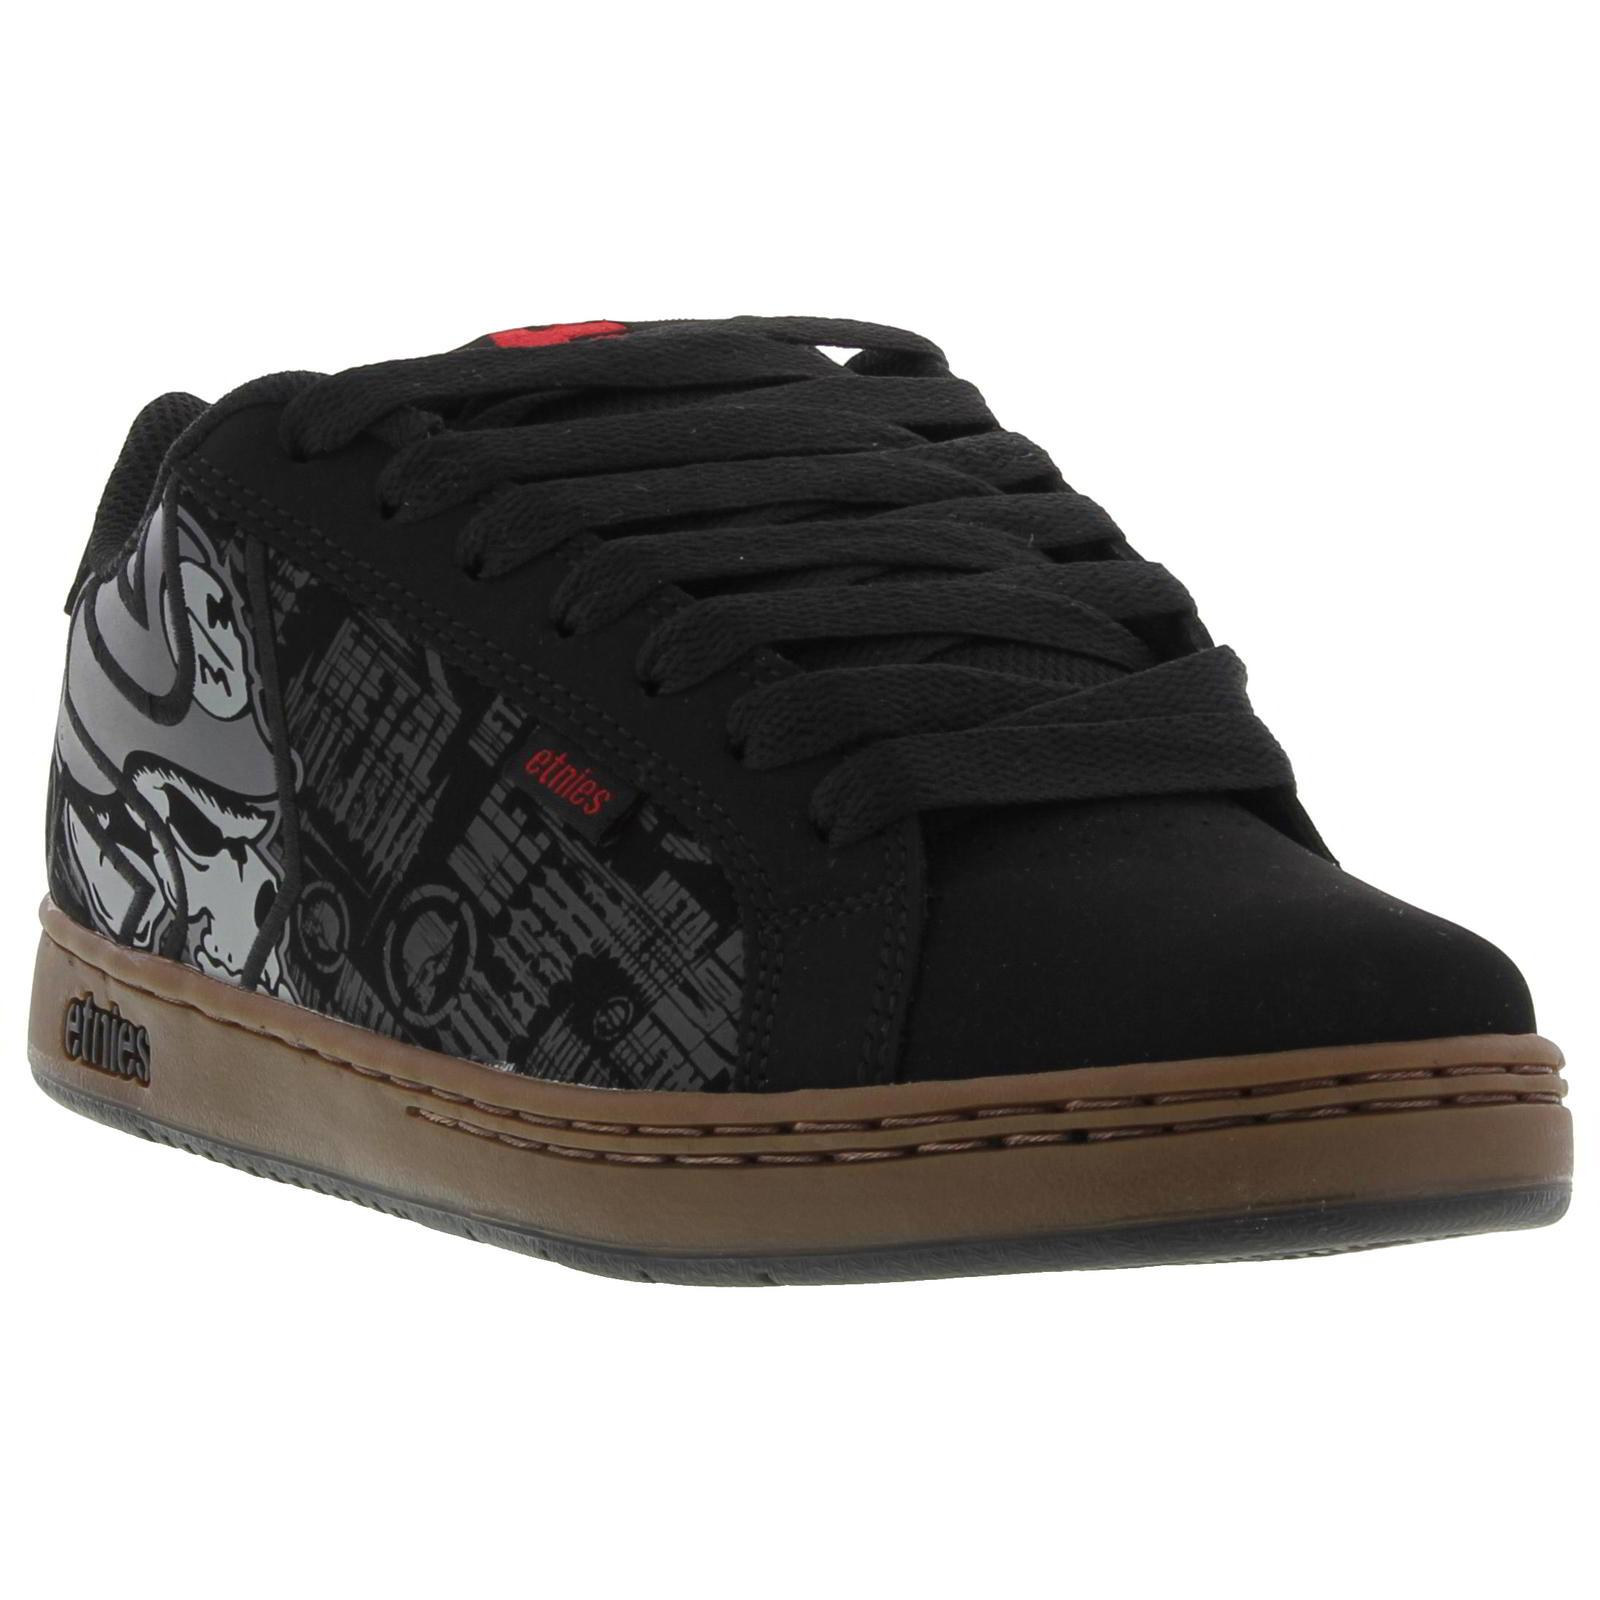 716908f8696 Details about Etnies Metal Mulisha Fader Mens Black White Skate Shoes  Trainers Size UK 8-10